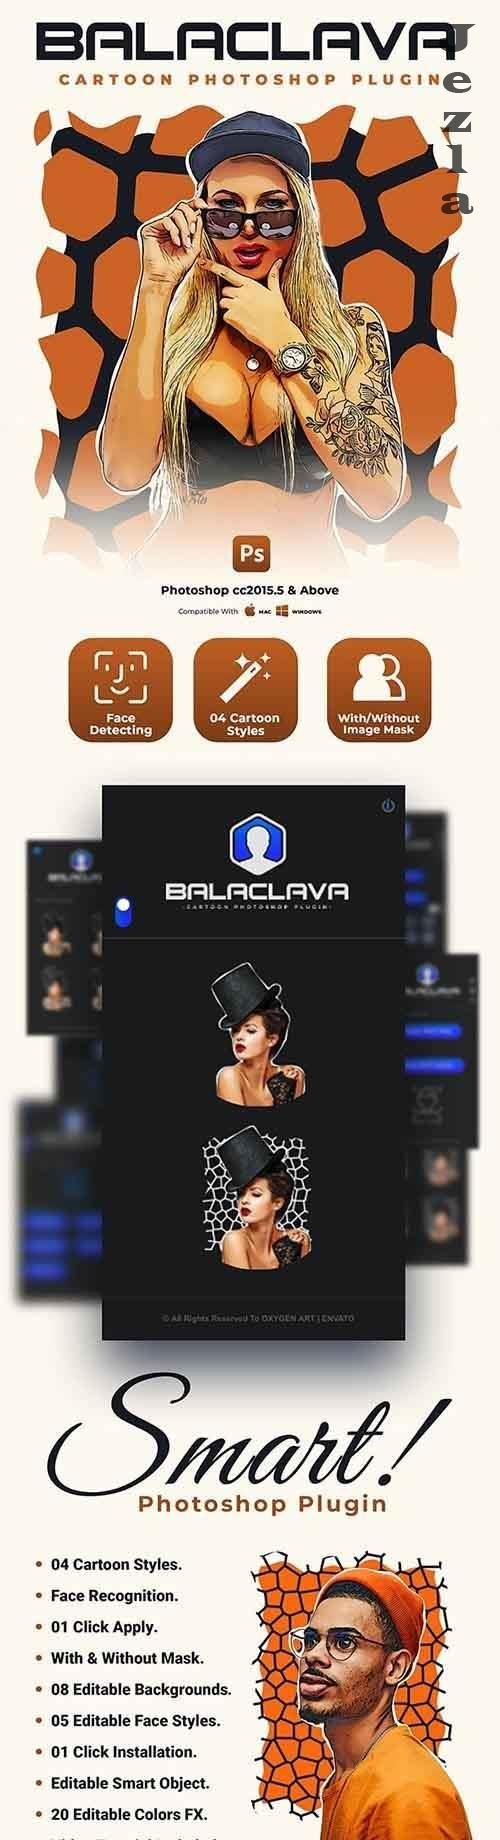 GraphicRiver - Balaclava - Cartoon Photoshop Plugin 28776537